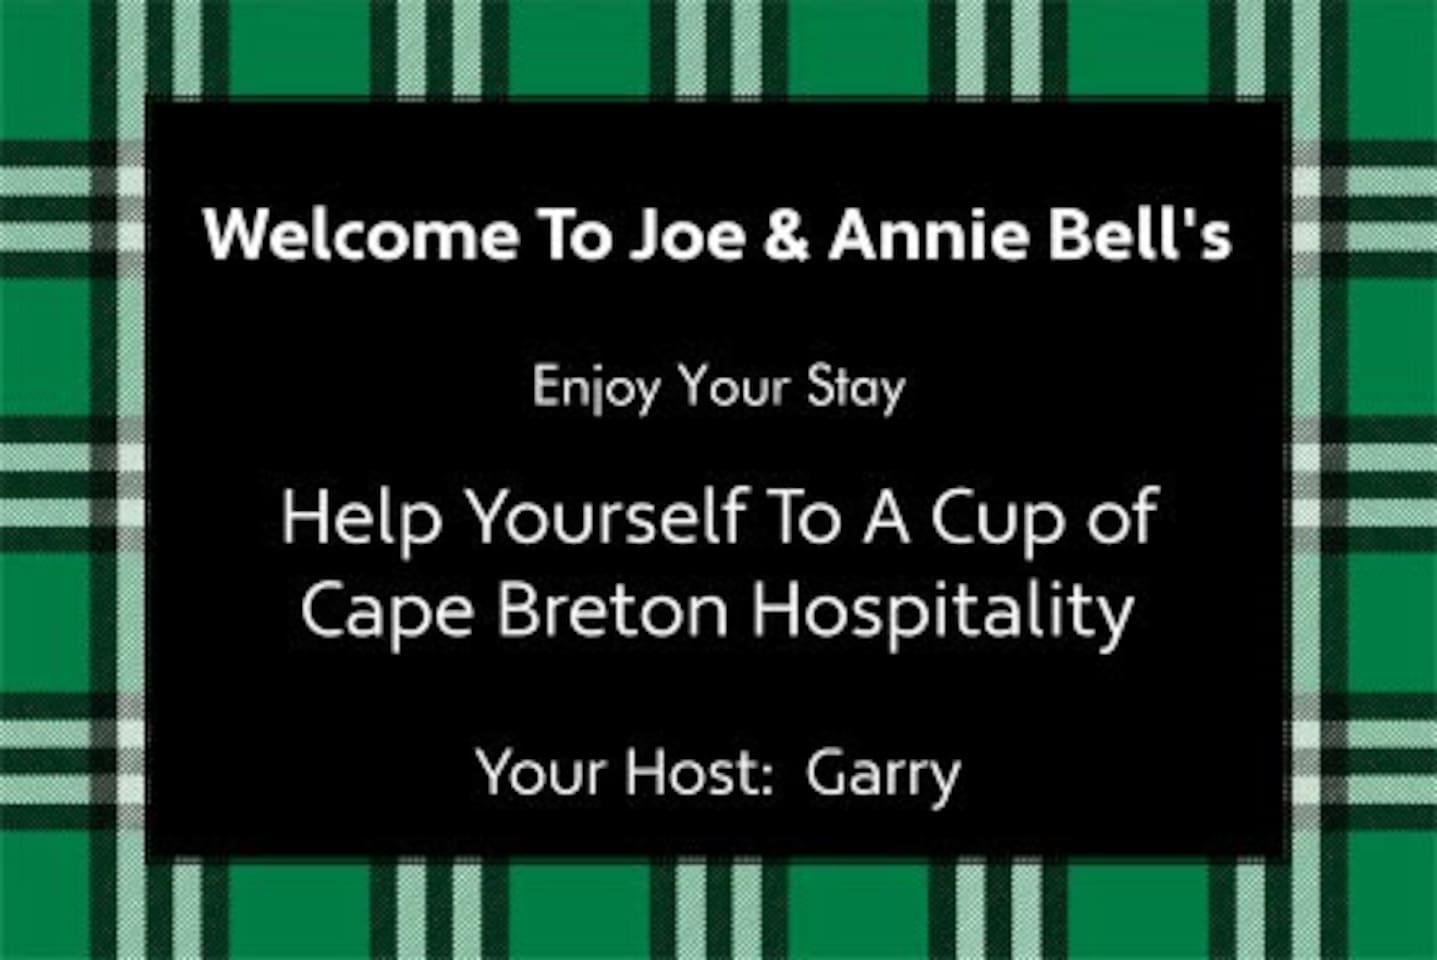 Welcome to Joe & Annie Belle 's Airbnb, Cape Breton, Nova Scotia